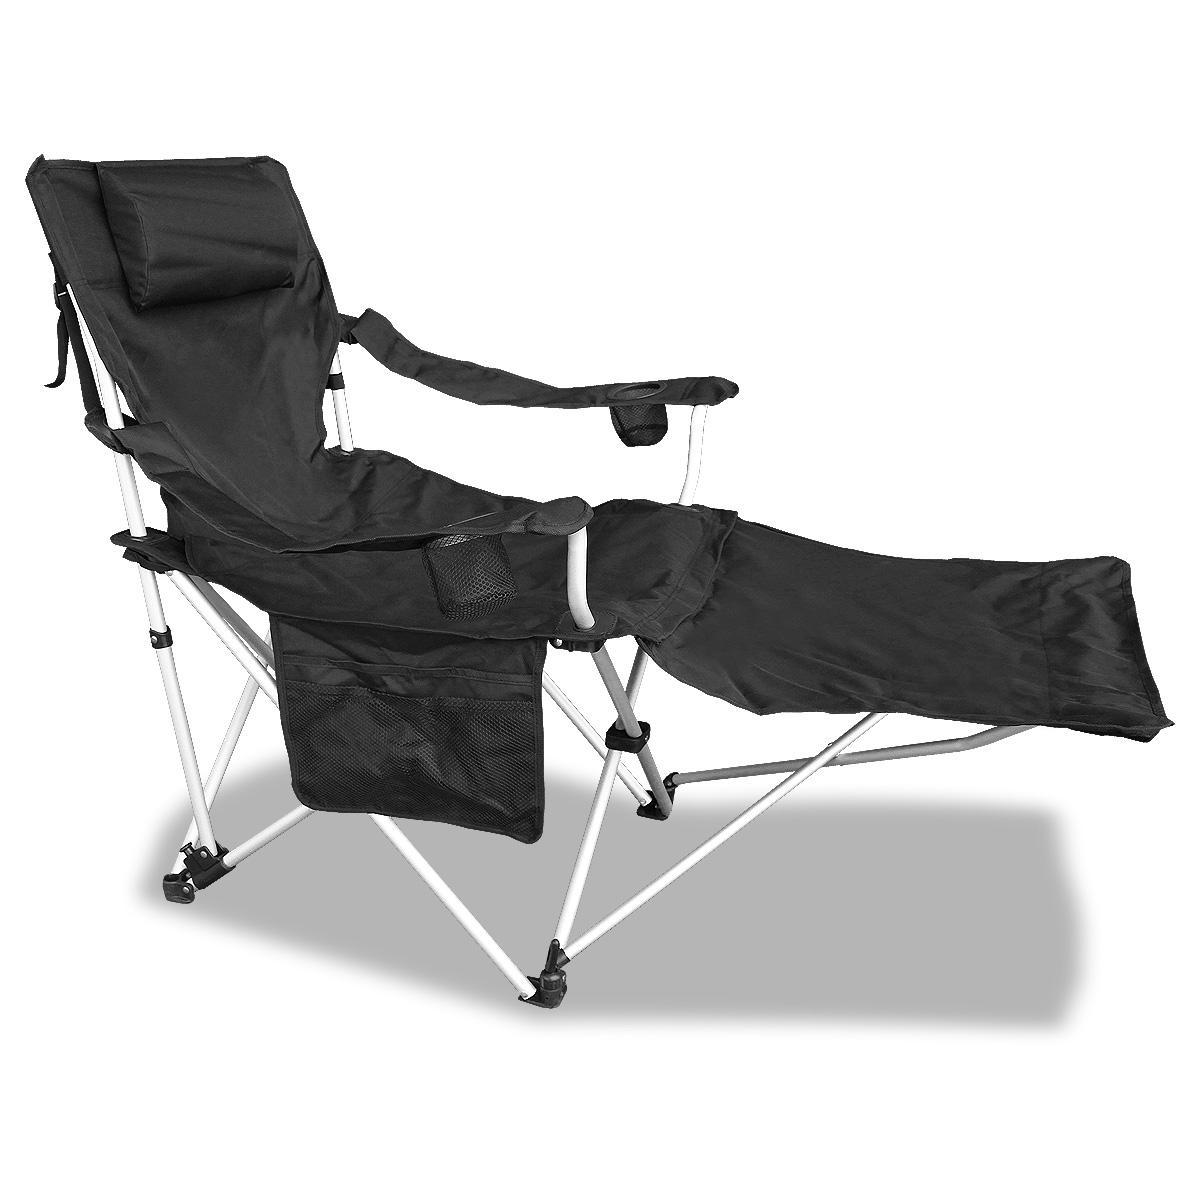 Relags Travelchair Luxus Stuhl 44445-210